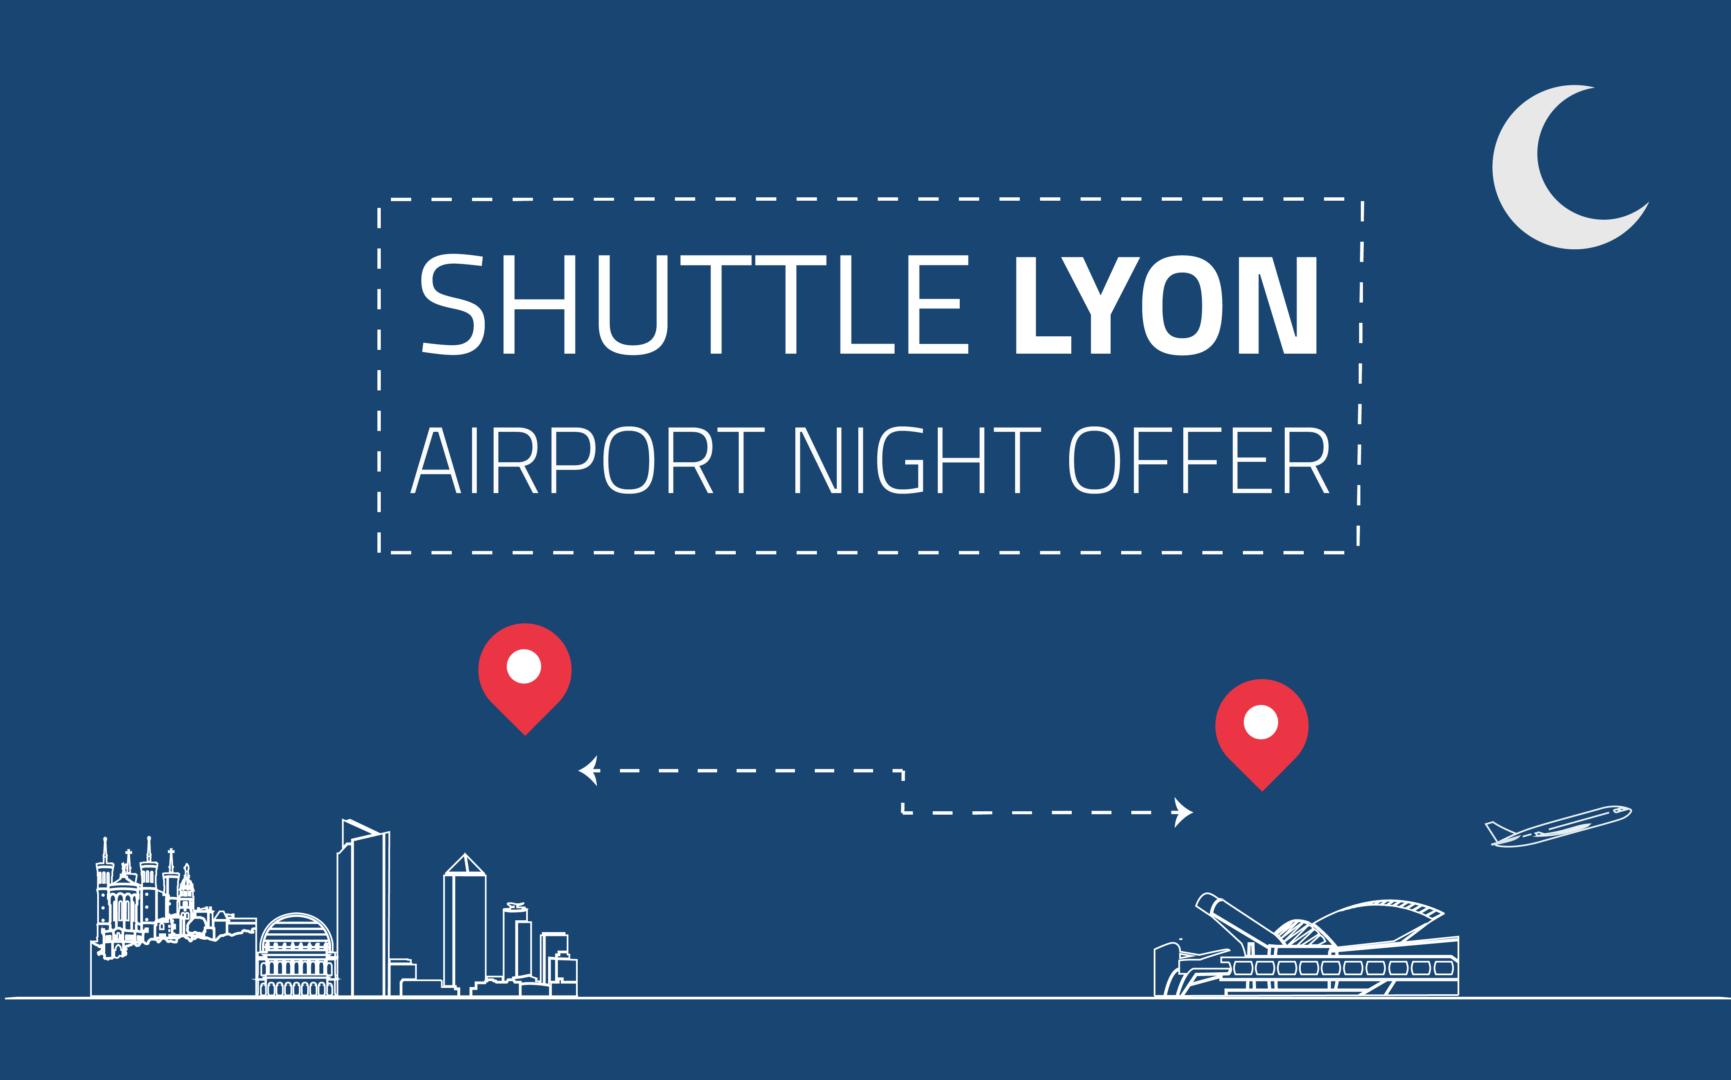 Shuttle Lyon night offer